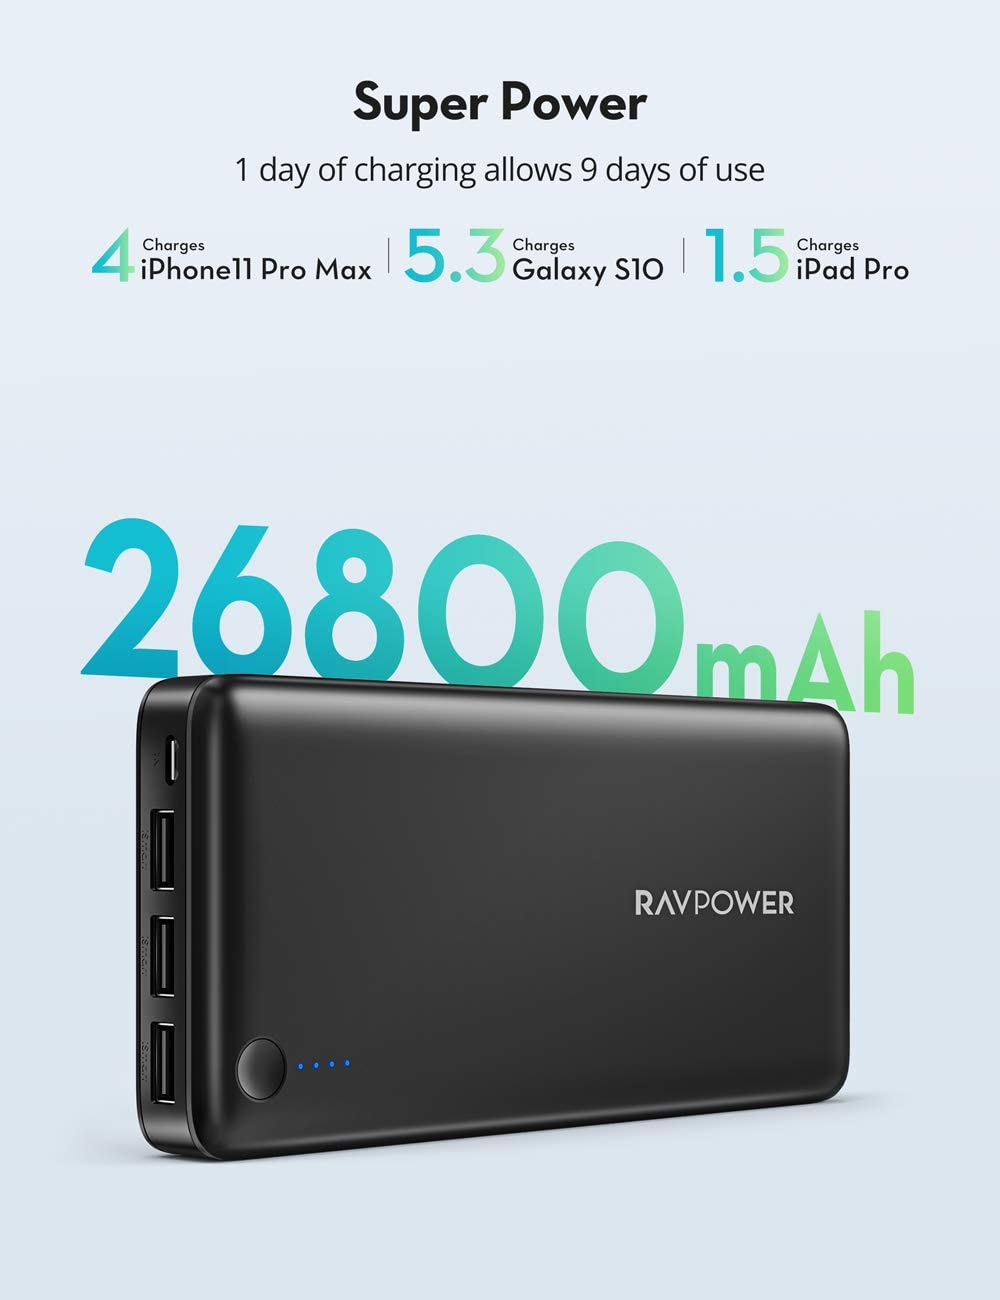 RAVPower banco de la energía del cargador 26800mah portable 26800 total de 5.5a de salida 3-puertos paquetes de batería externa (entrada 2.4a, ismart power pack usb 2.0) portátil cargador del teléfono: Amazon.es: